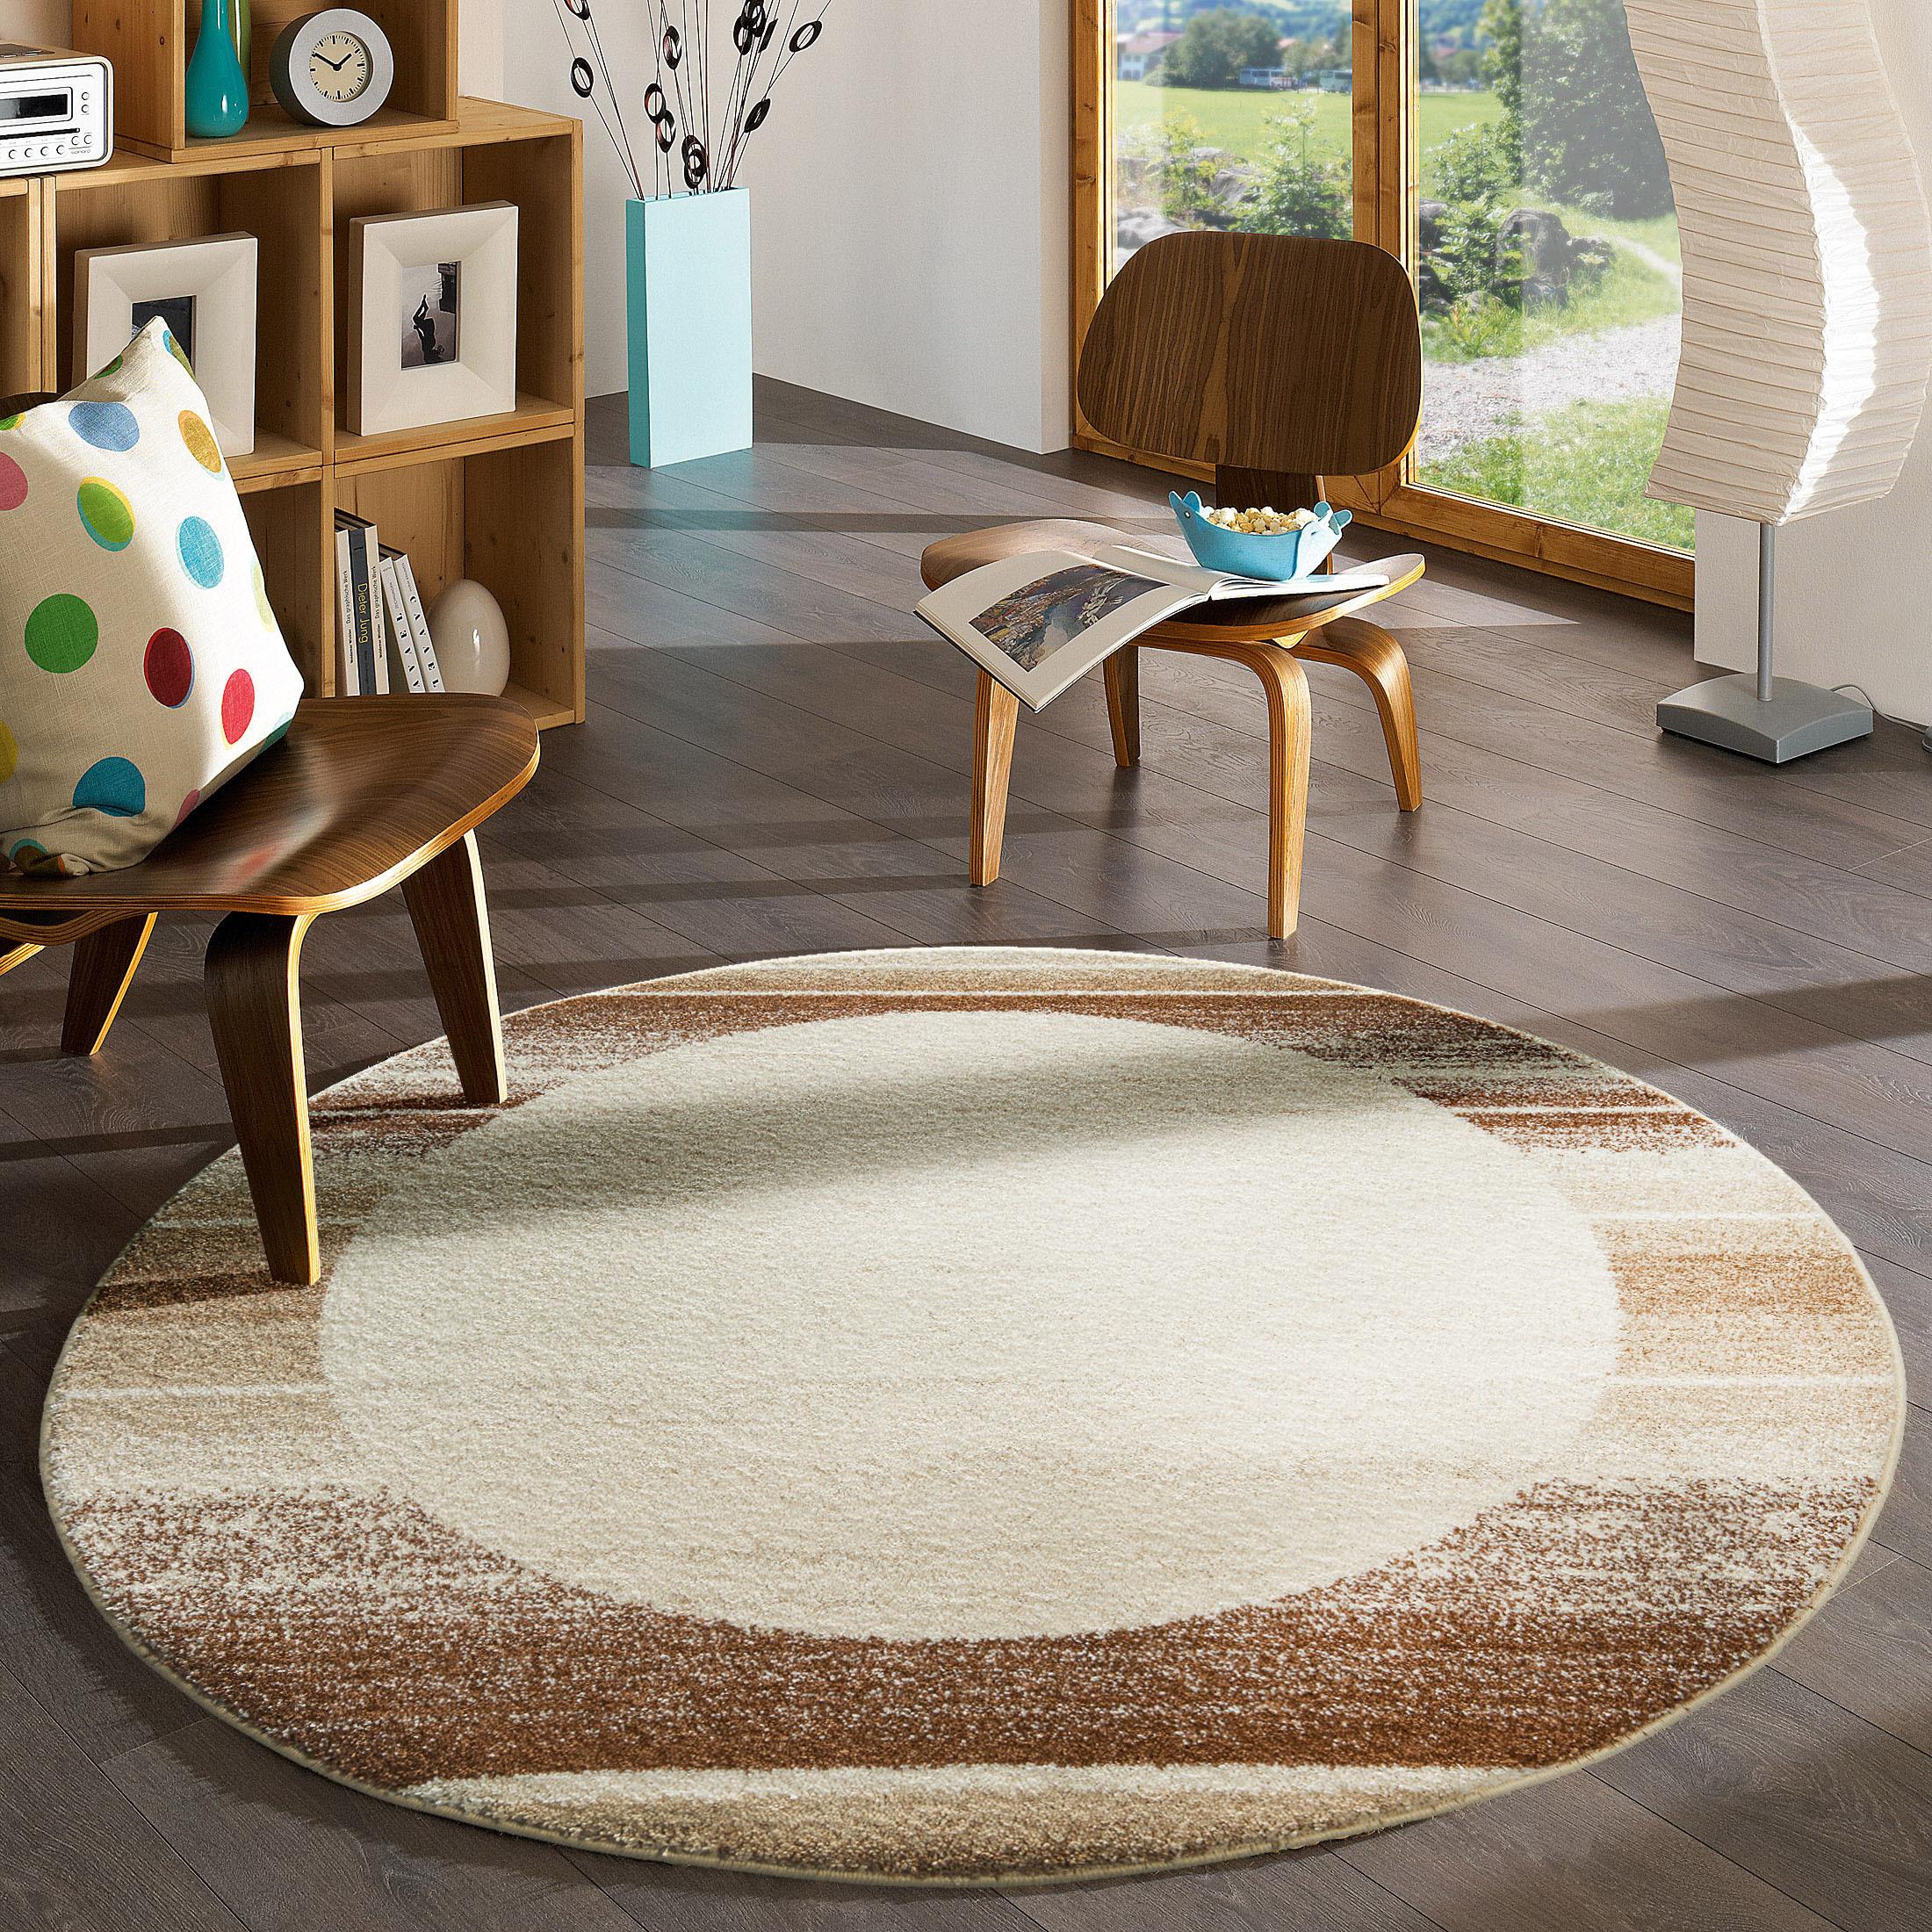 night life designer teppich von kibek in beige. Black Bedroom Furniture Sets. Home Design Ideas